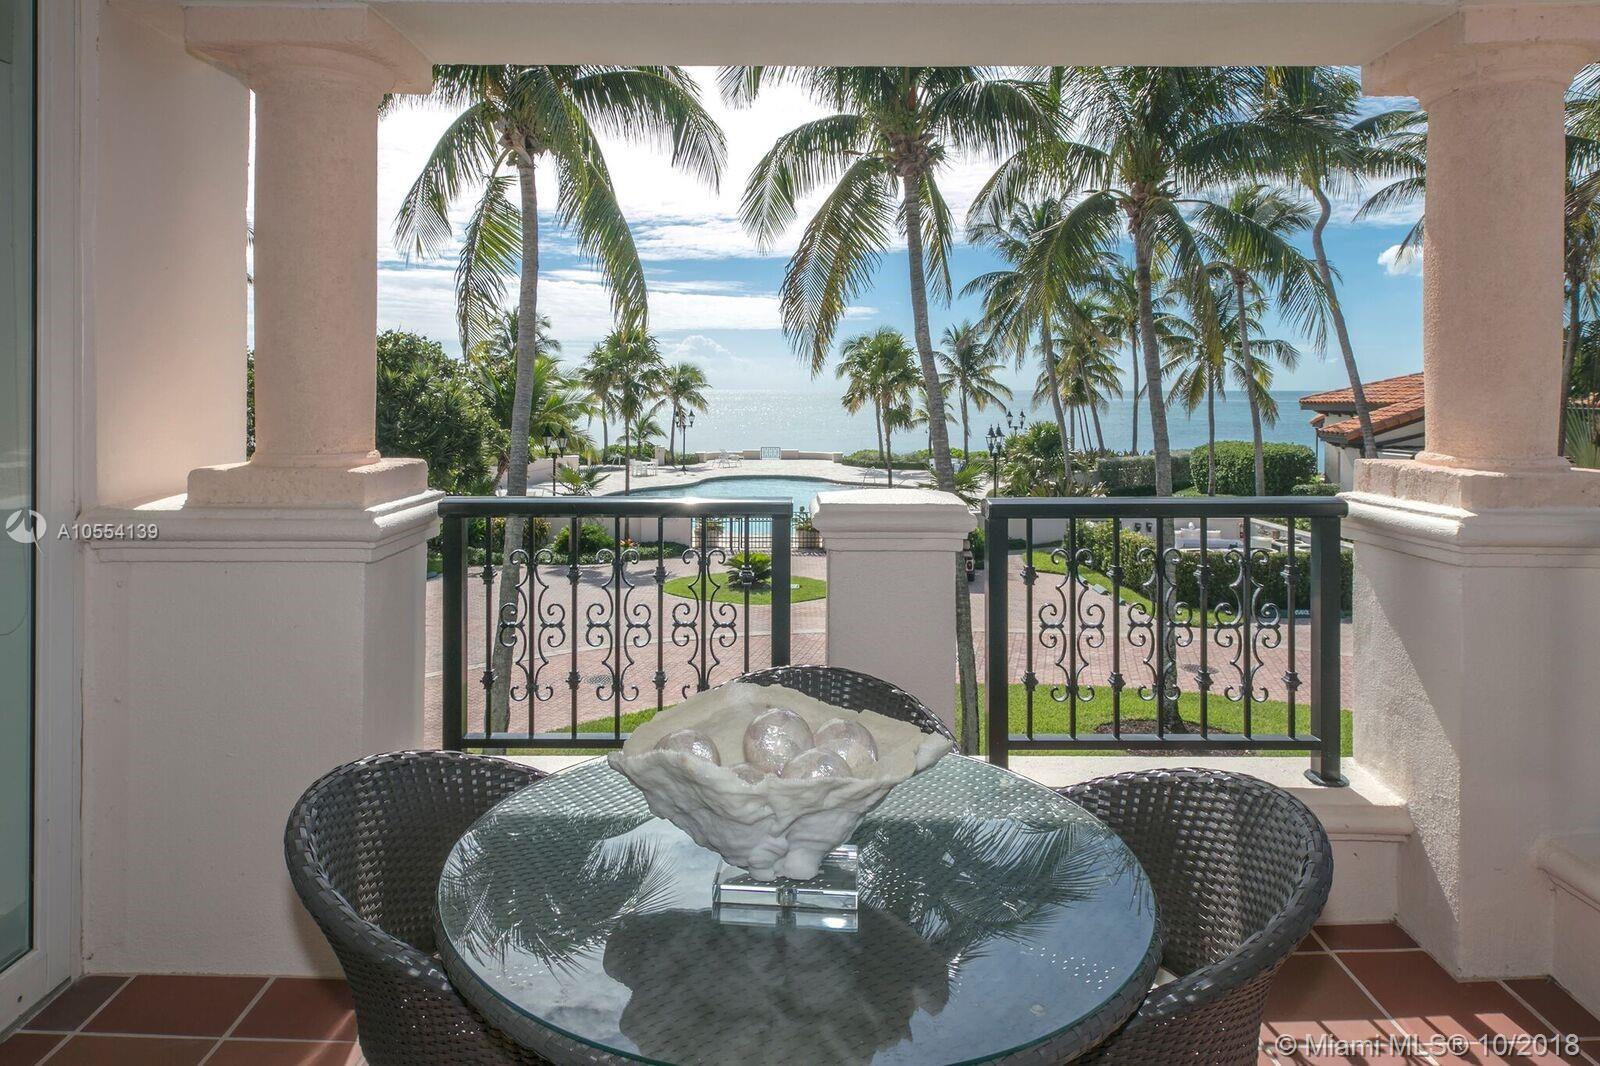 15721 Fisher Island Dr 15721+15722, Miami Beach, FL 33109